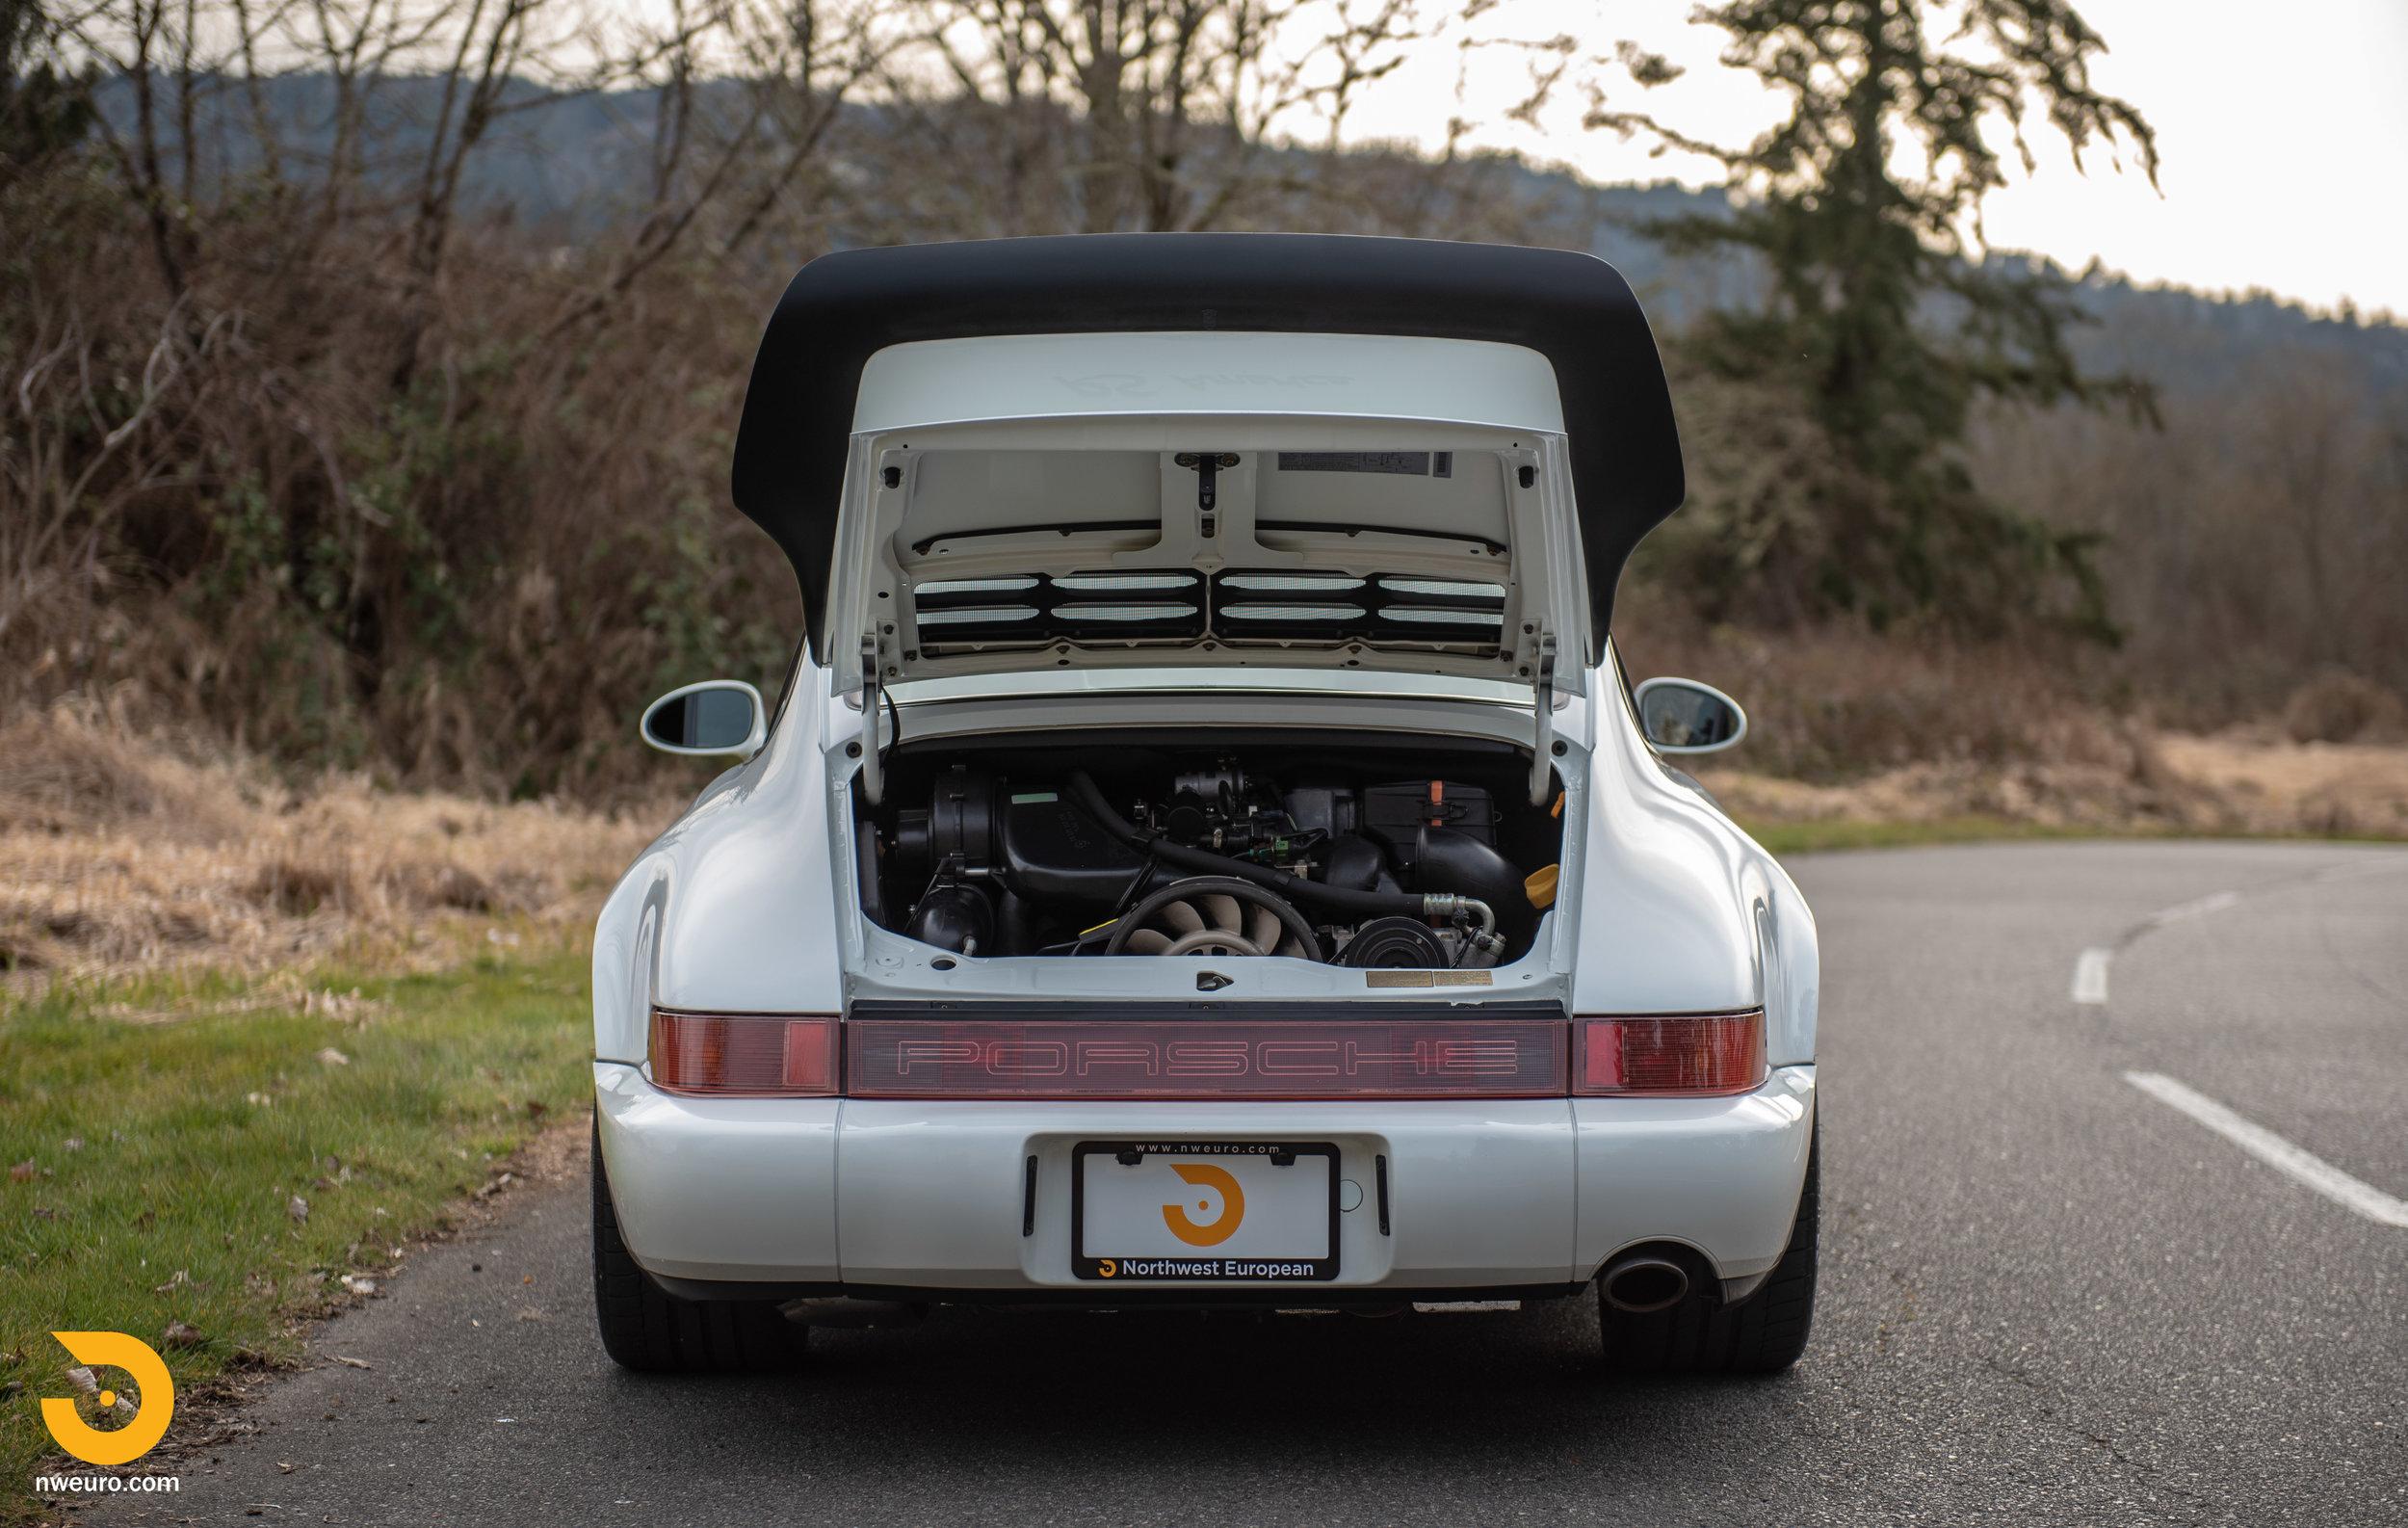 1993 Porsche RS America White-119.jpg